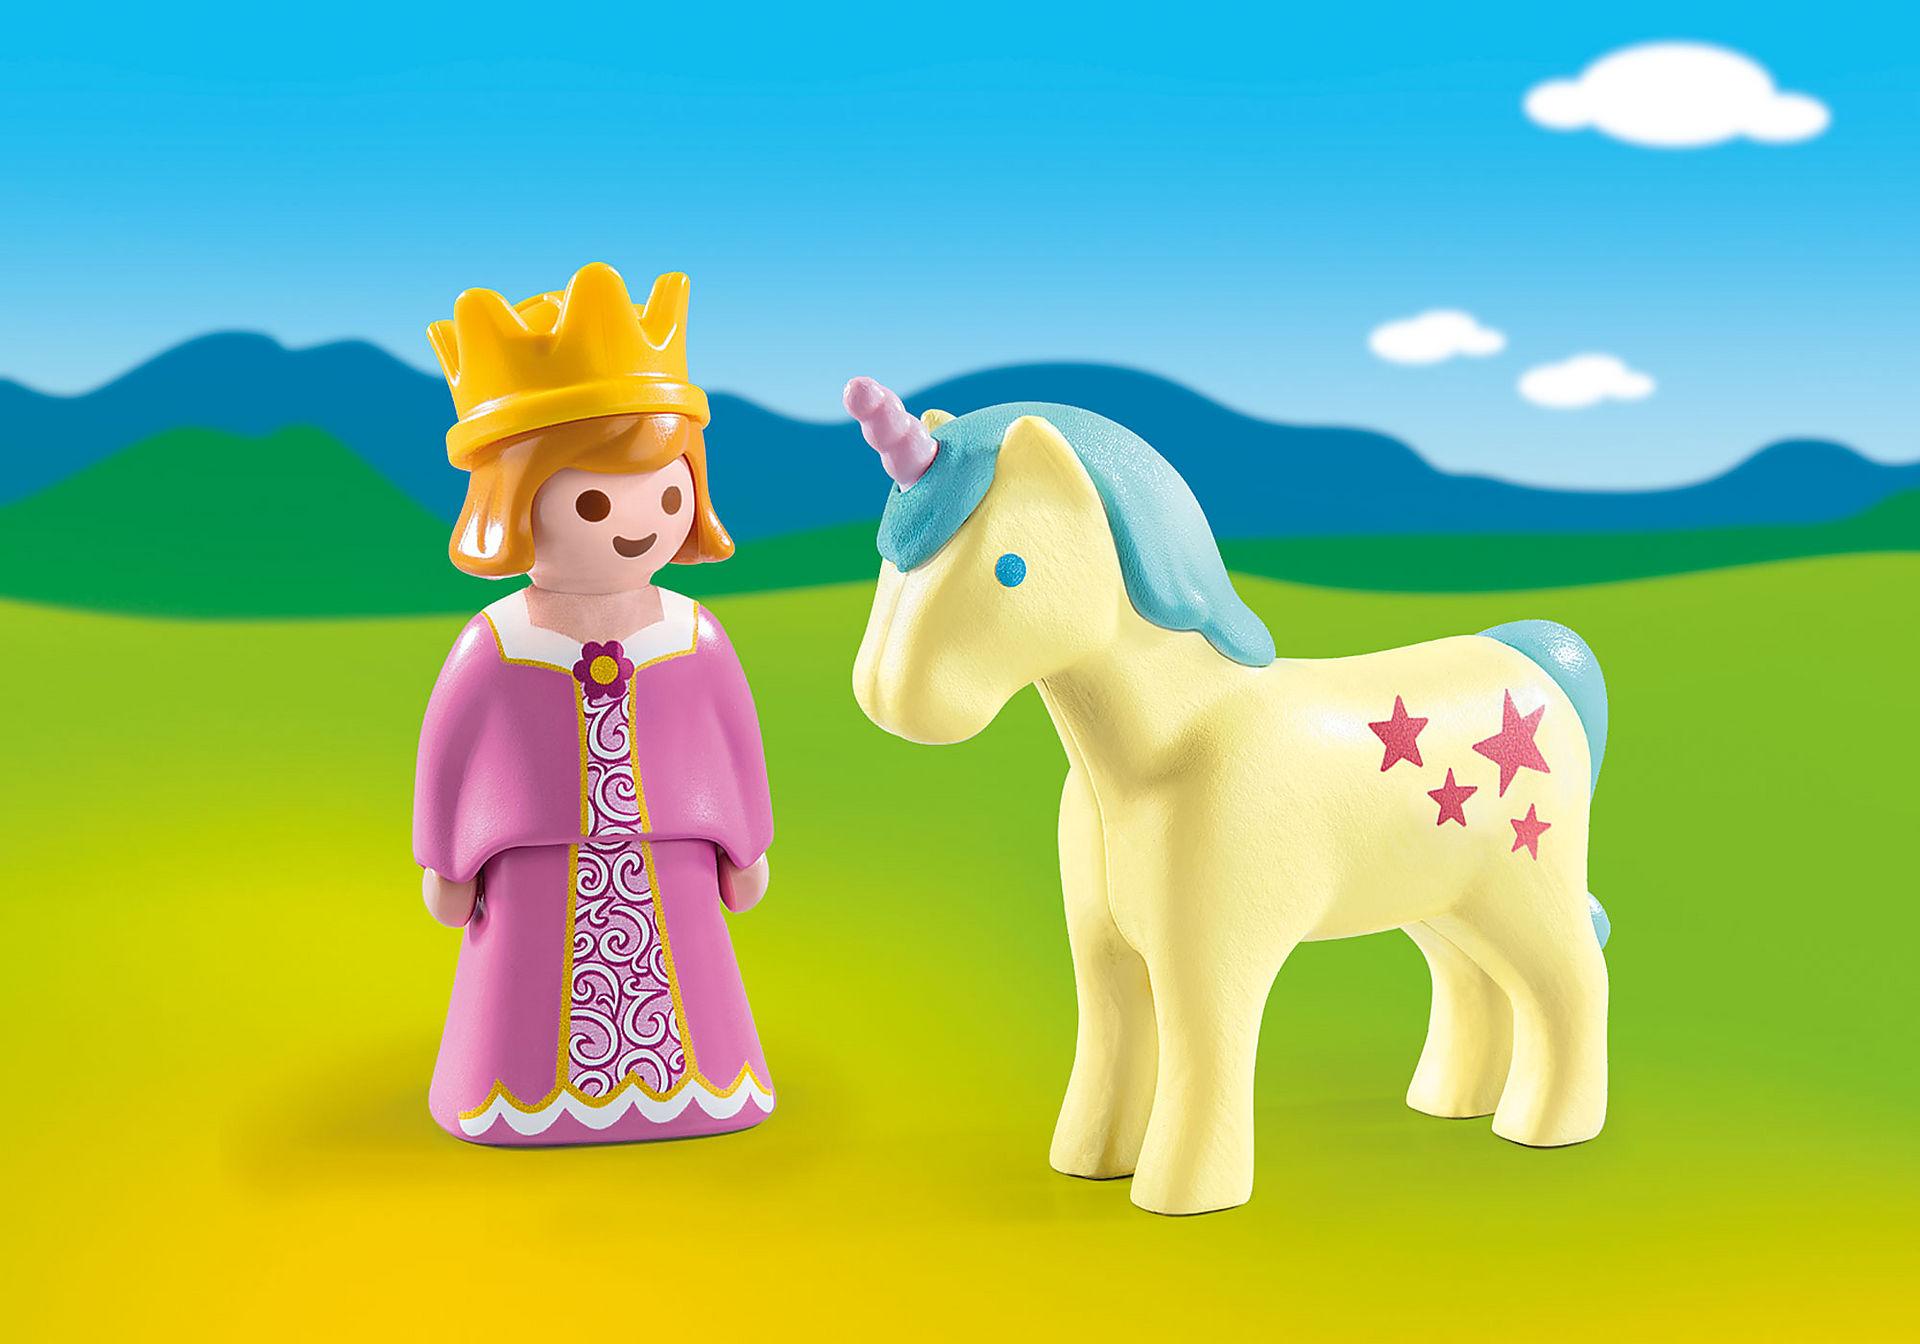 70127 1.2.3 Princesa con Unicornio zoom image1